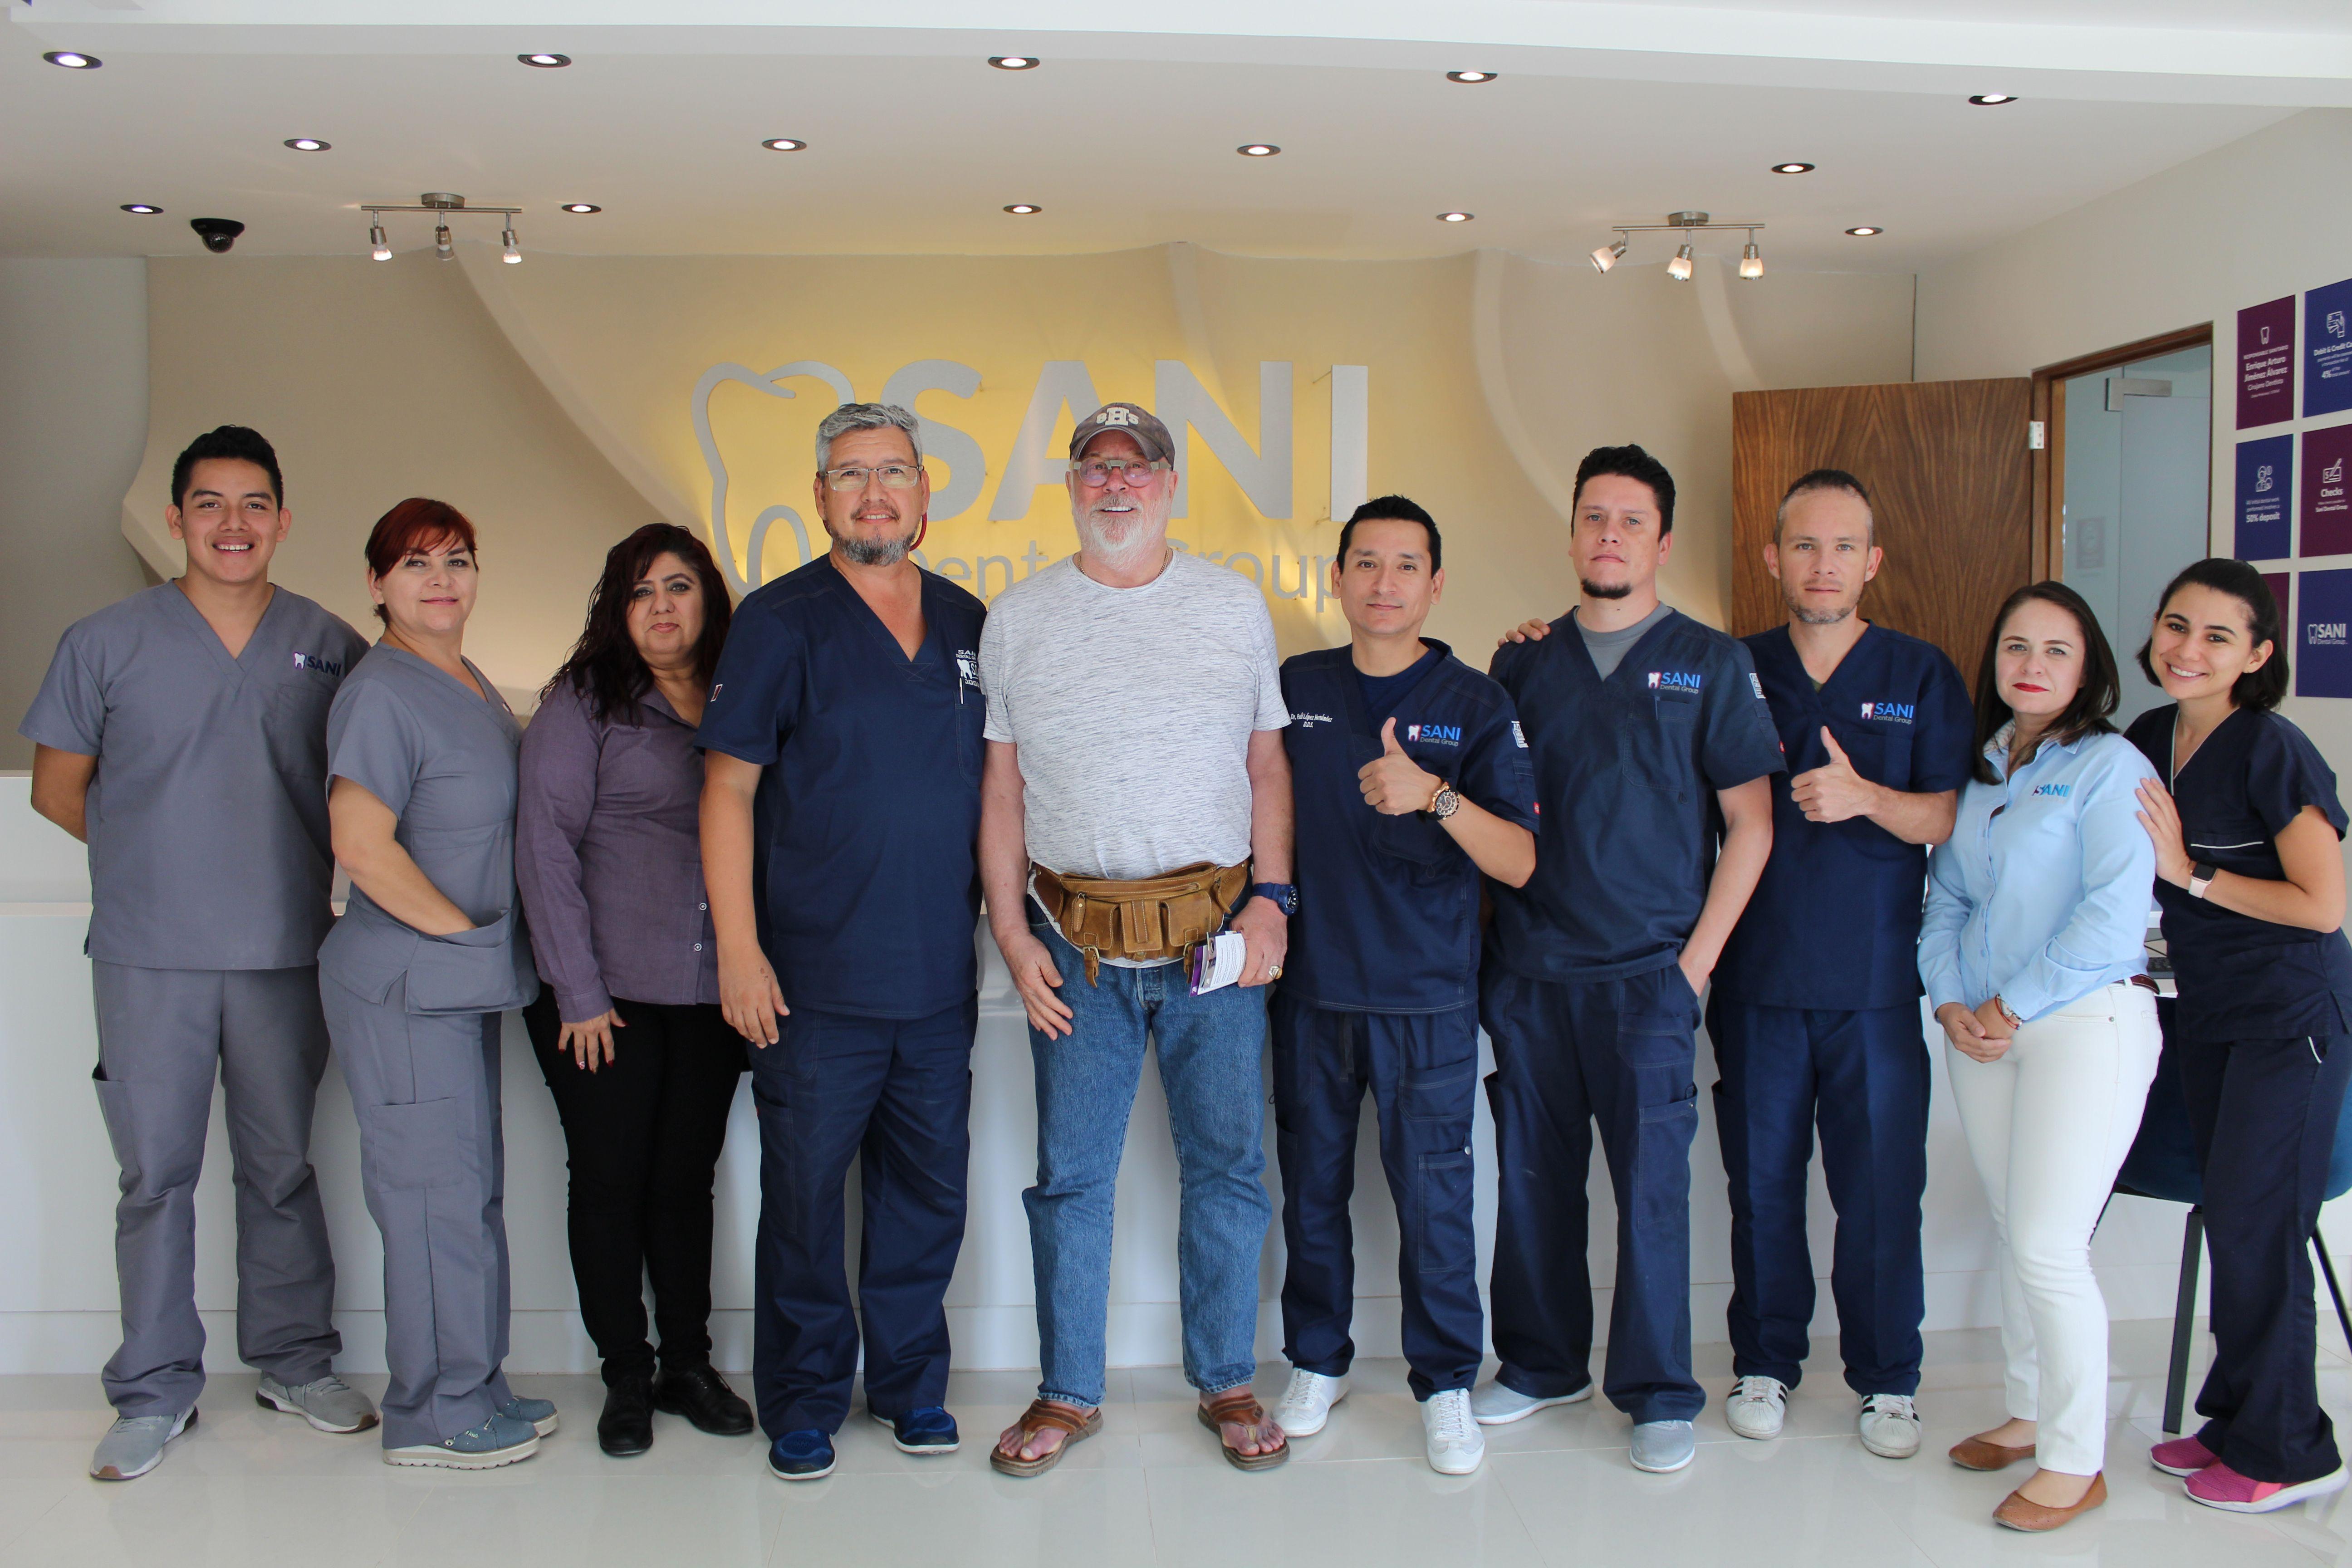 Sani Dental Group Cancun Riviera